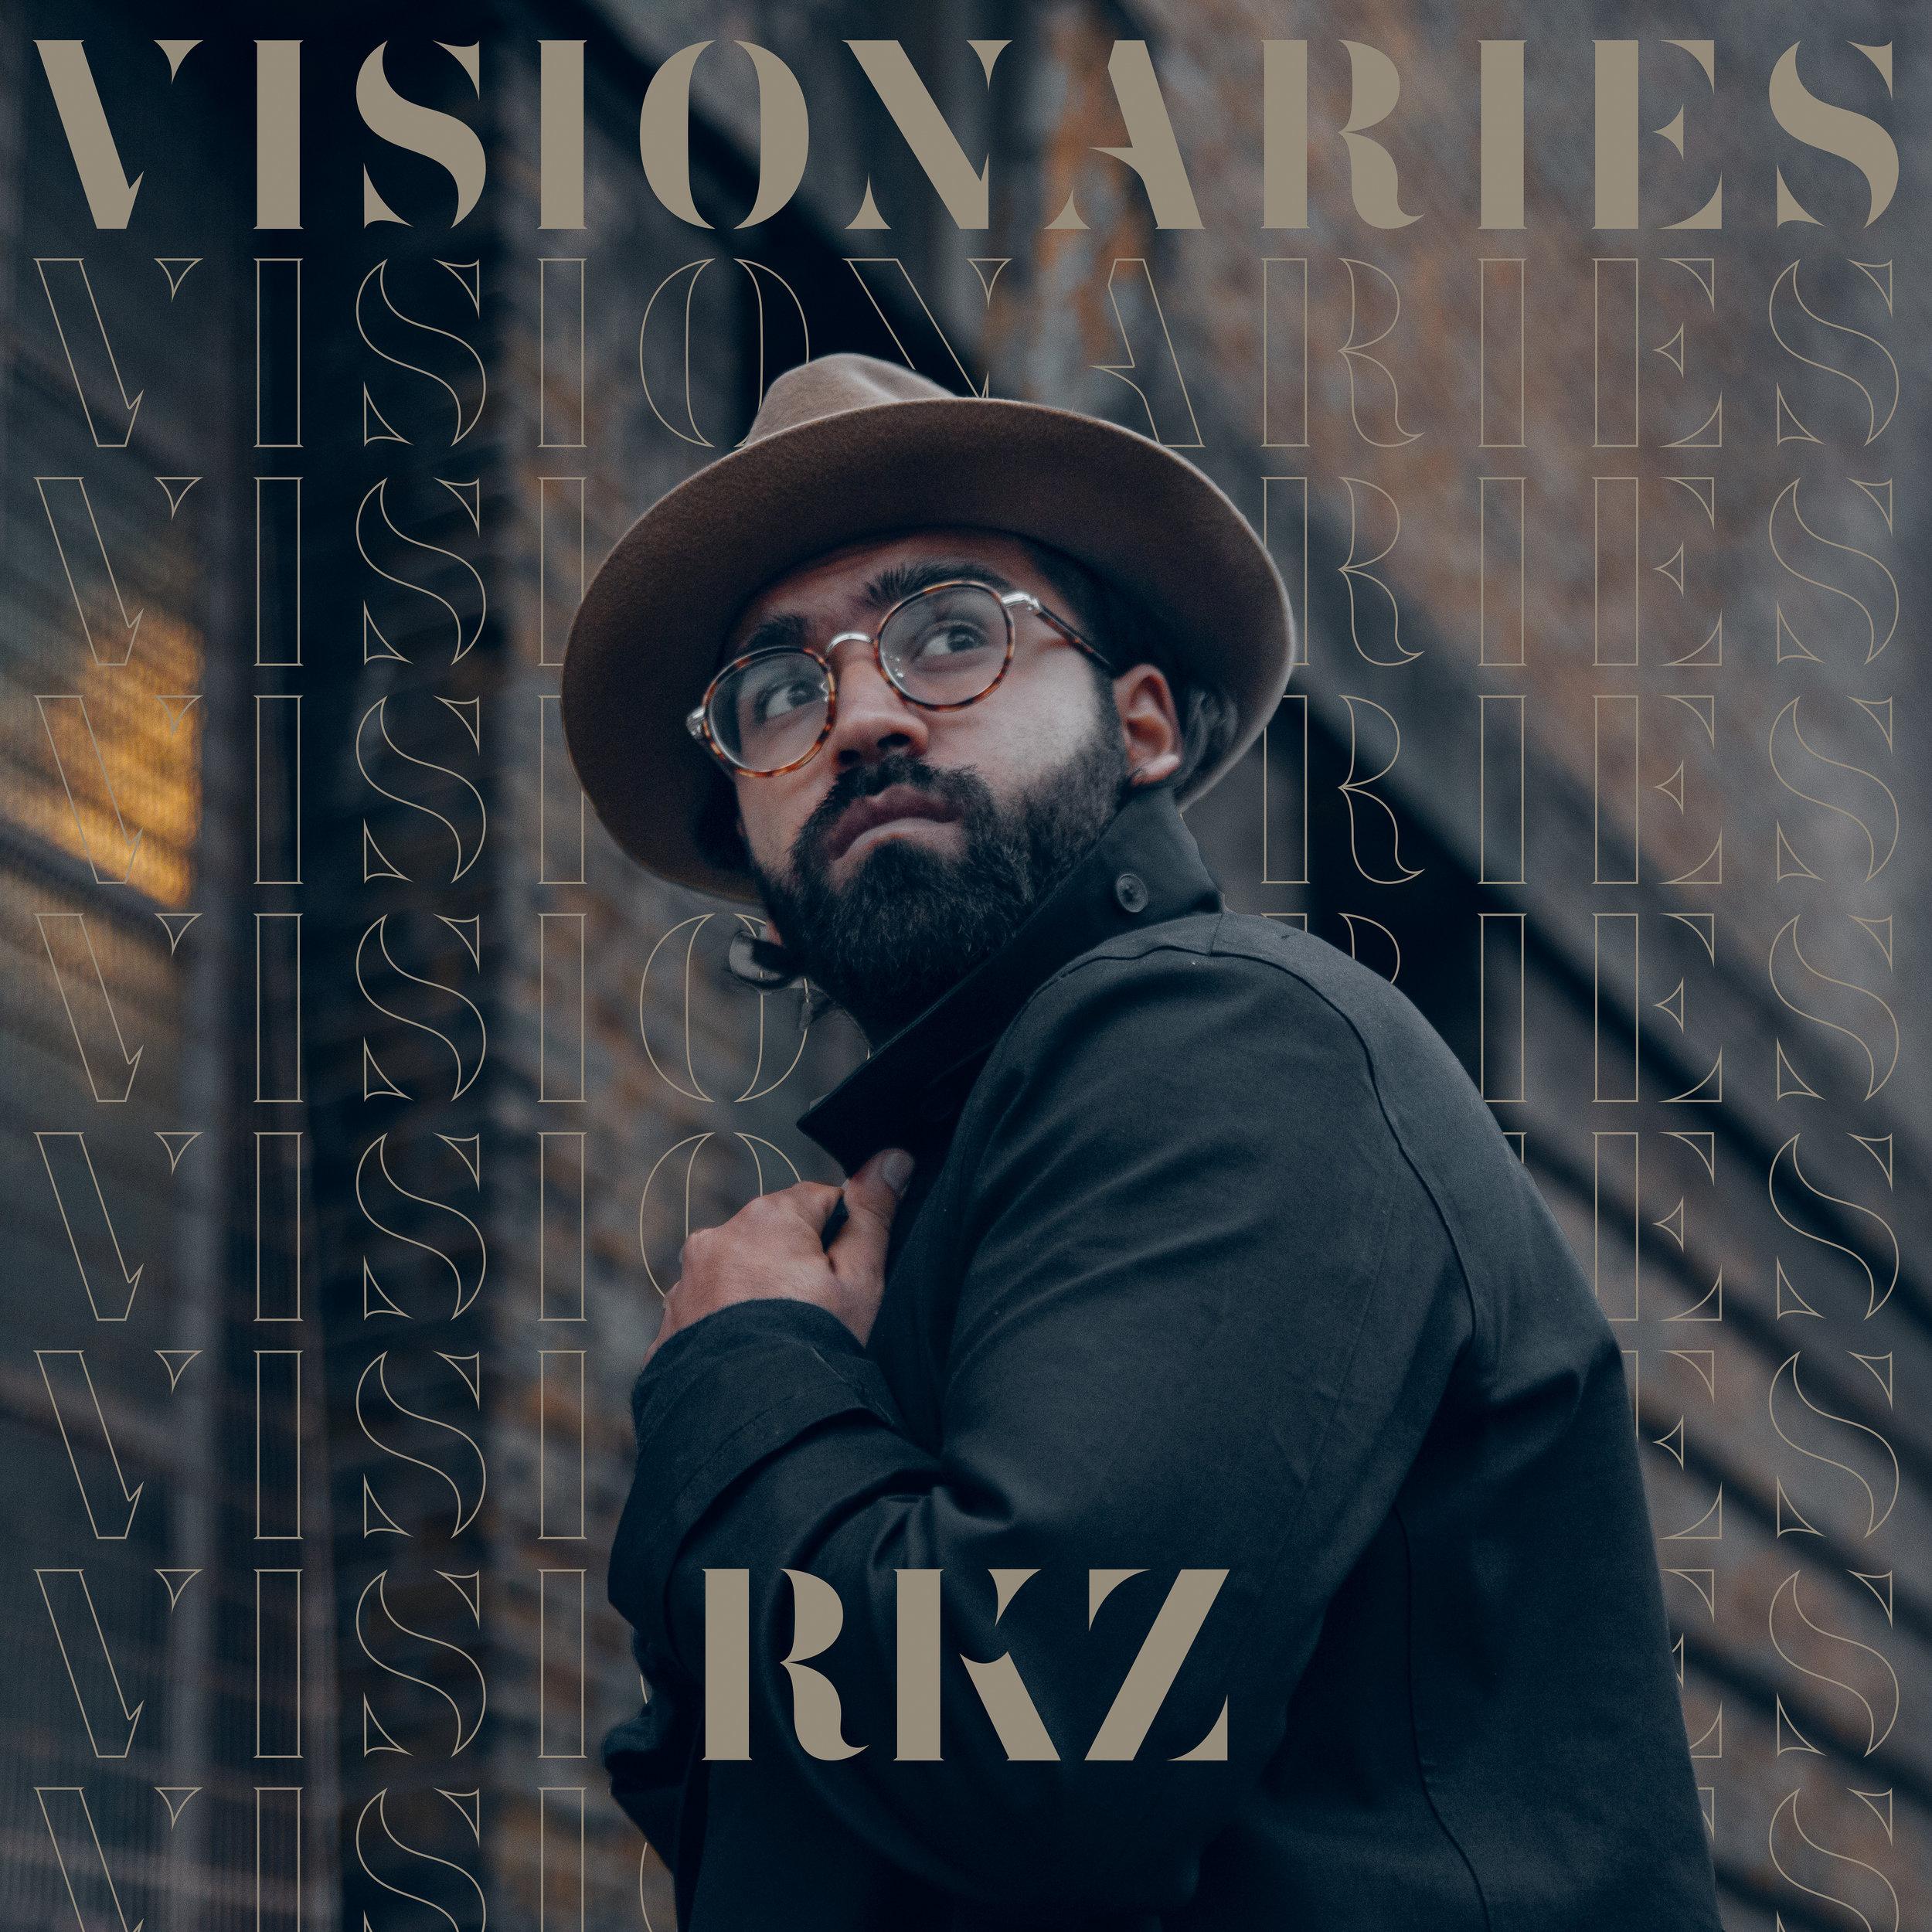 RKZ_Visionaries_Album.jpg